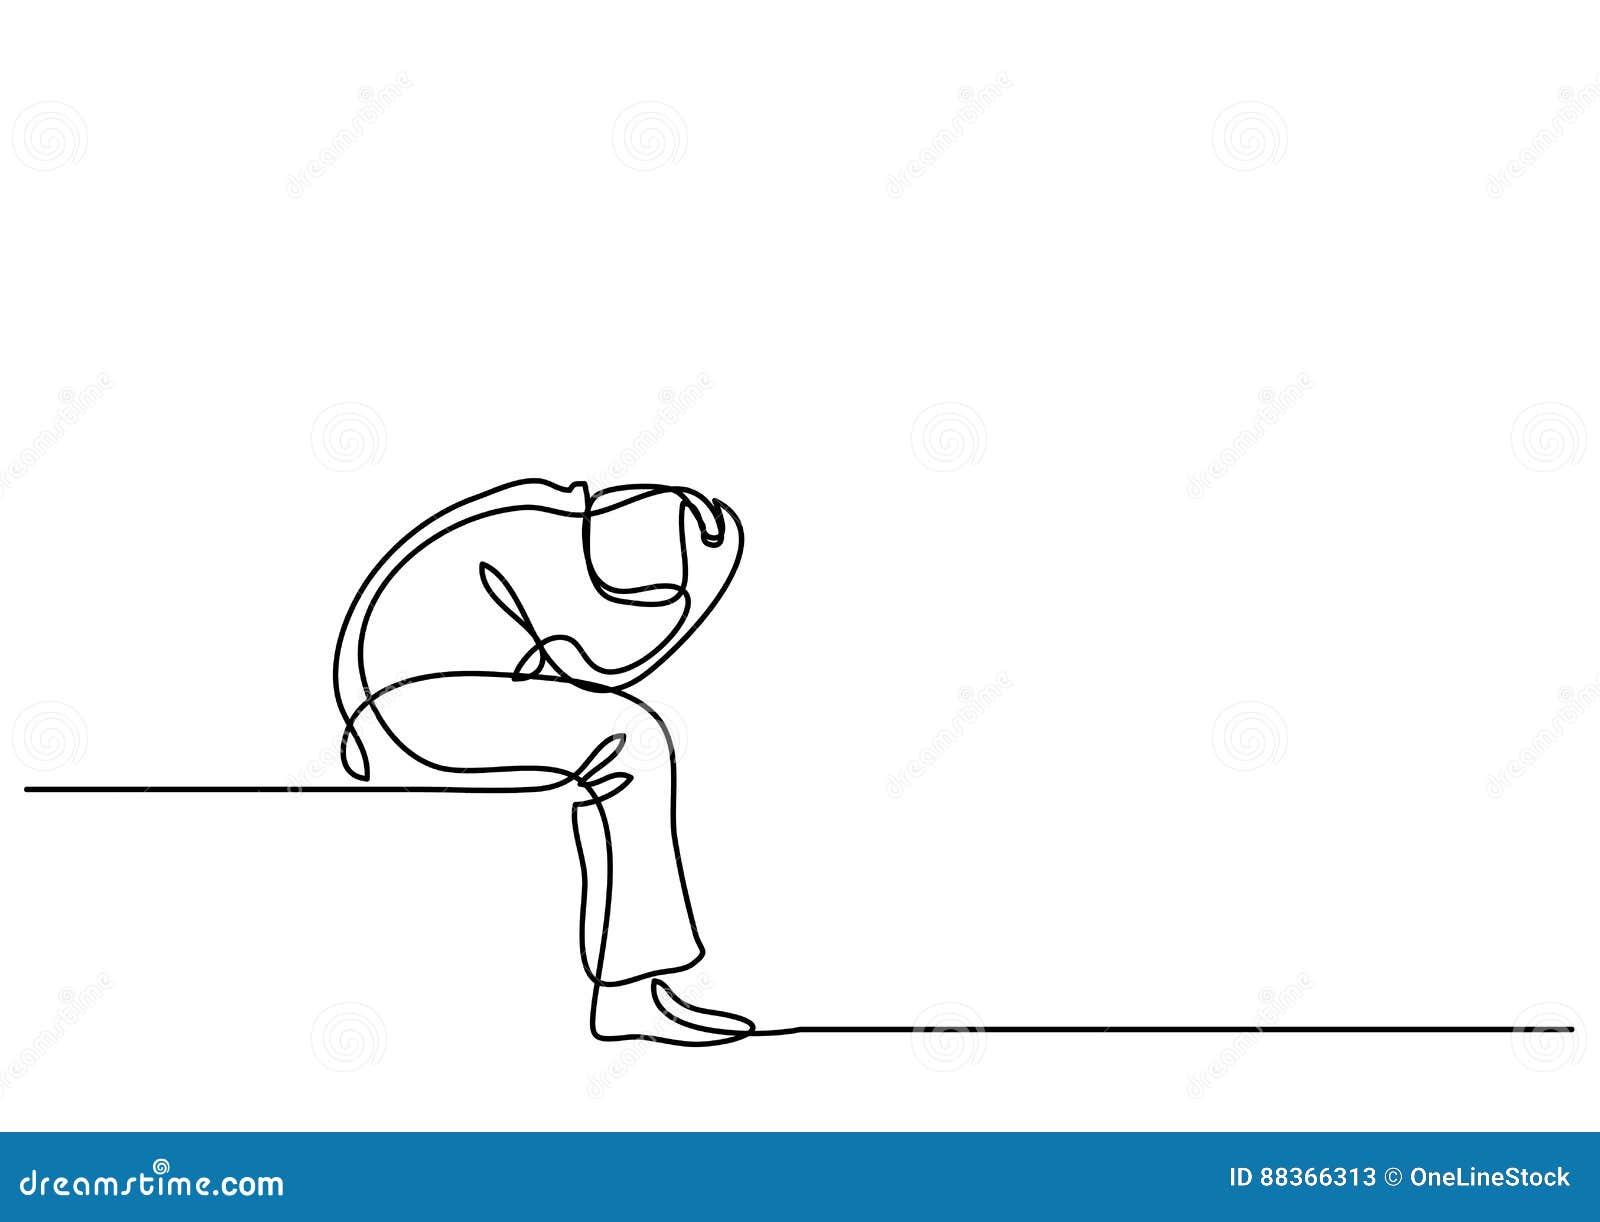 Dibujo lineal continuo de la sentada deprimida del hombre